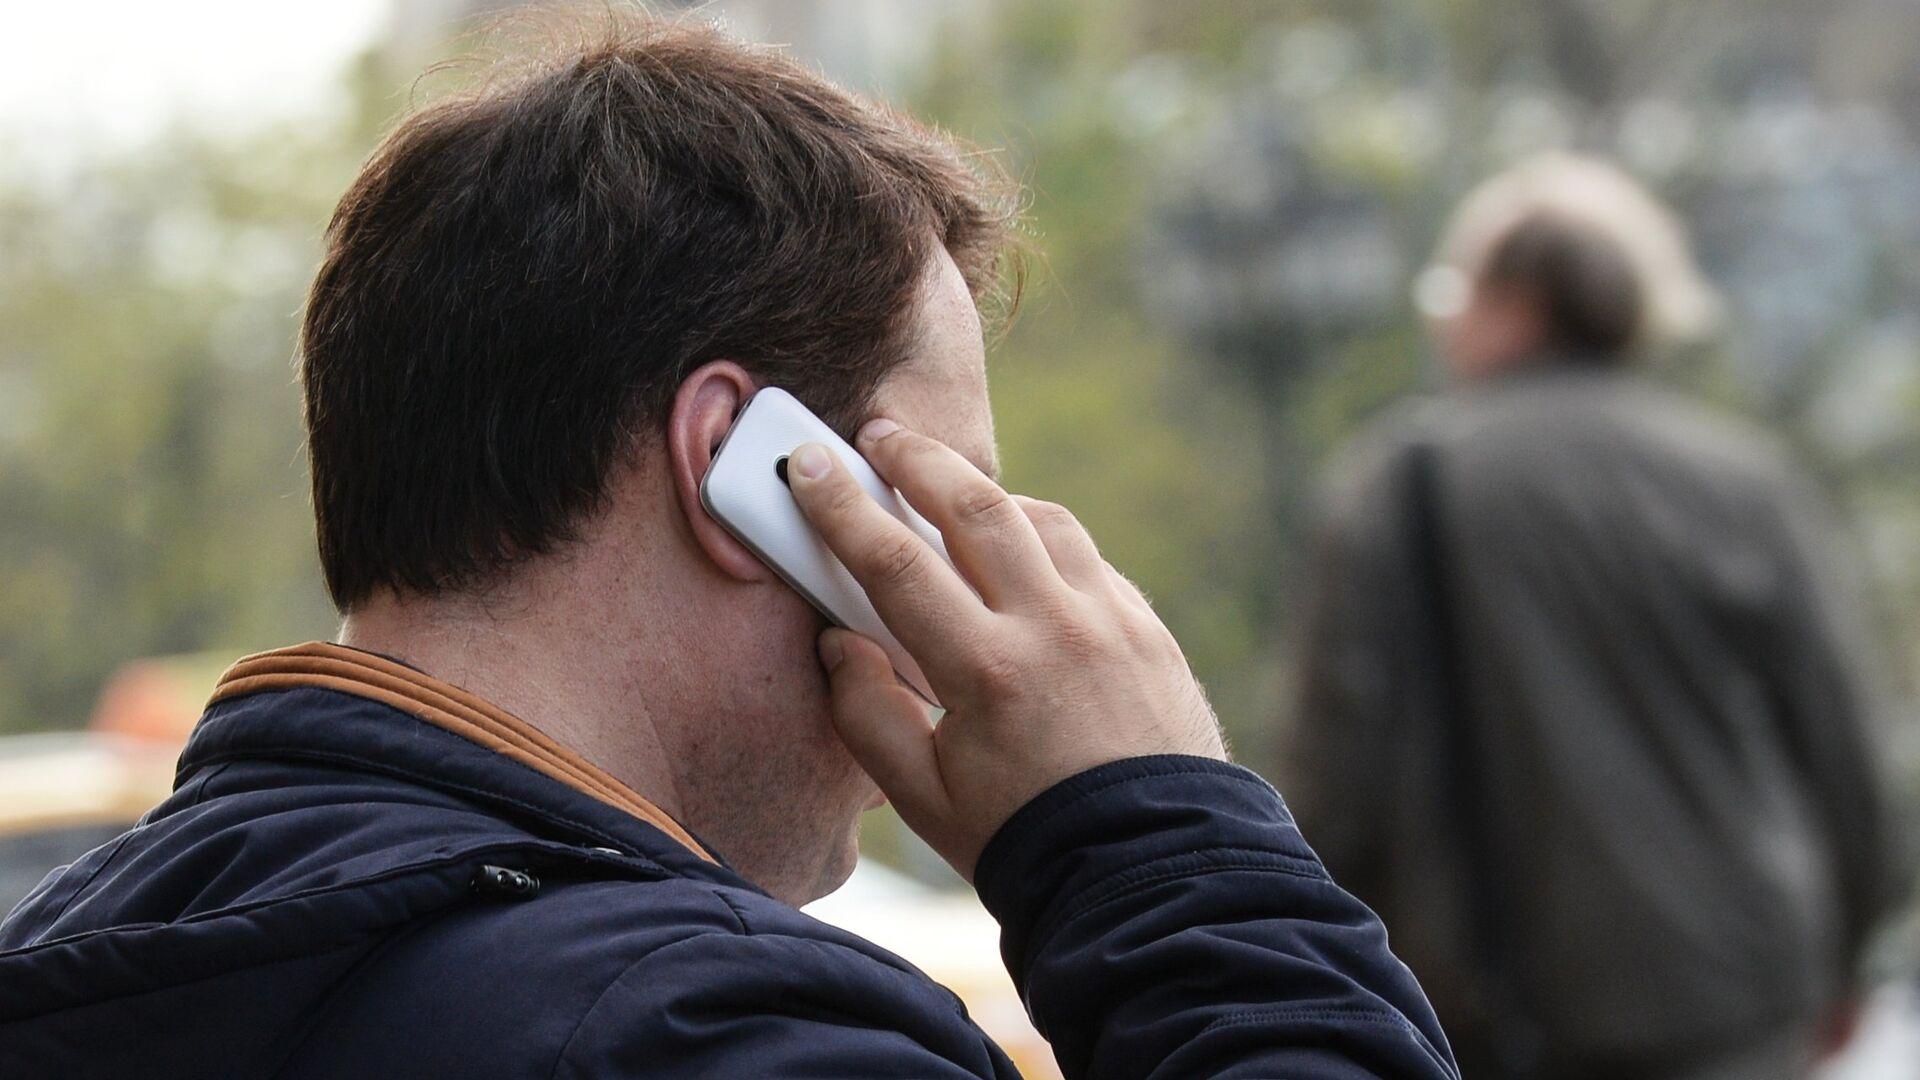 Мужчина говорит по телефону на улице Москвы. - РИА Новости, 1920, 17.09.2020